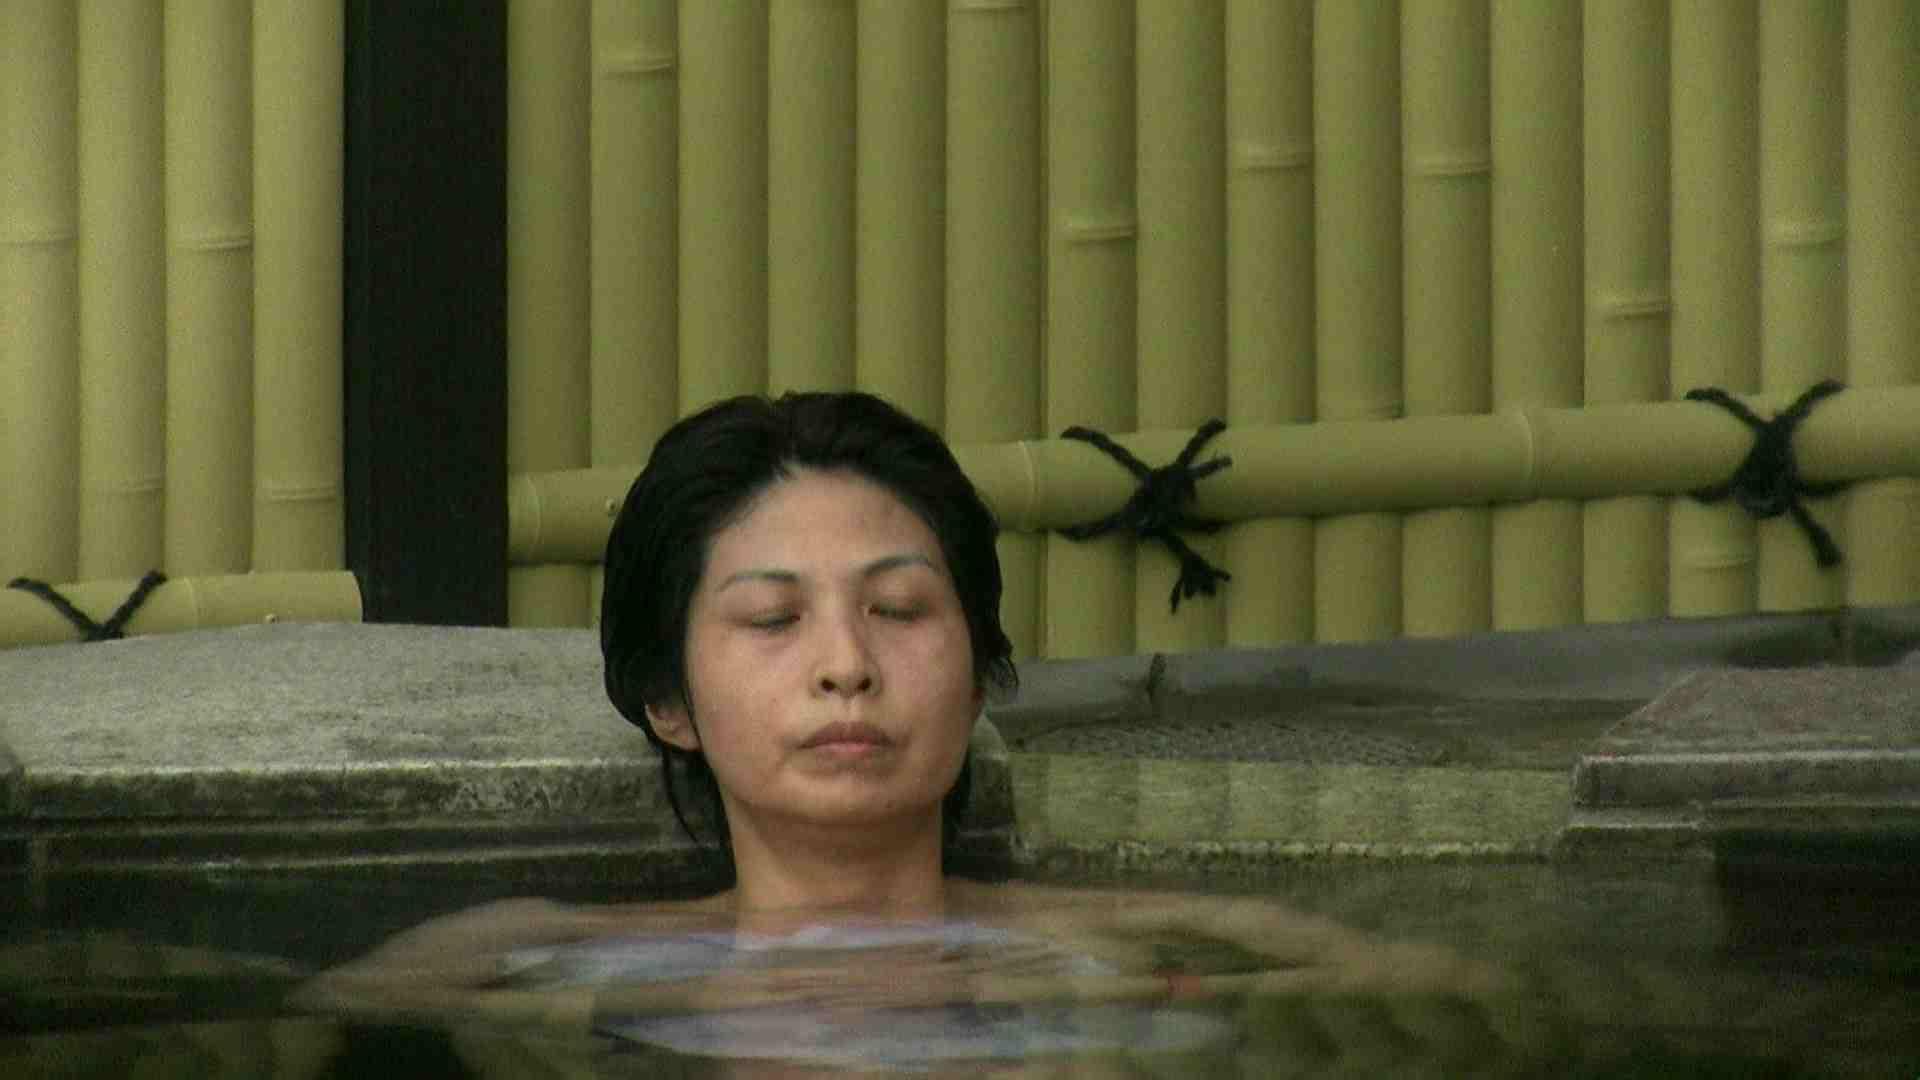 Aquaな露天風呂Vol.636 女体盗撮 盗み撮りSEX無修正画像 87連発 29